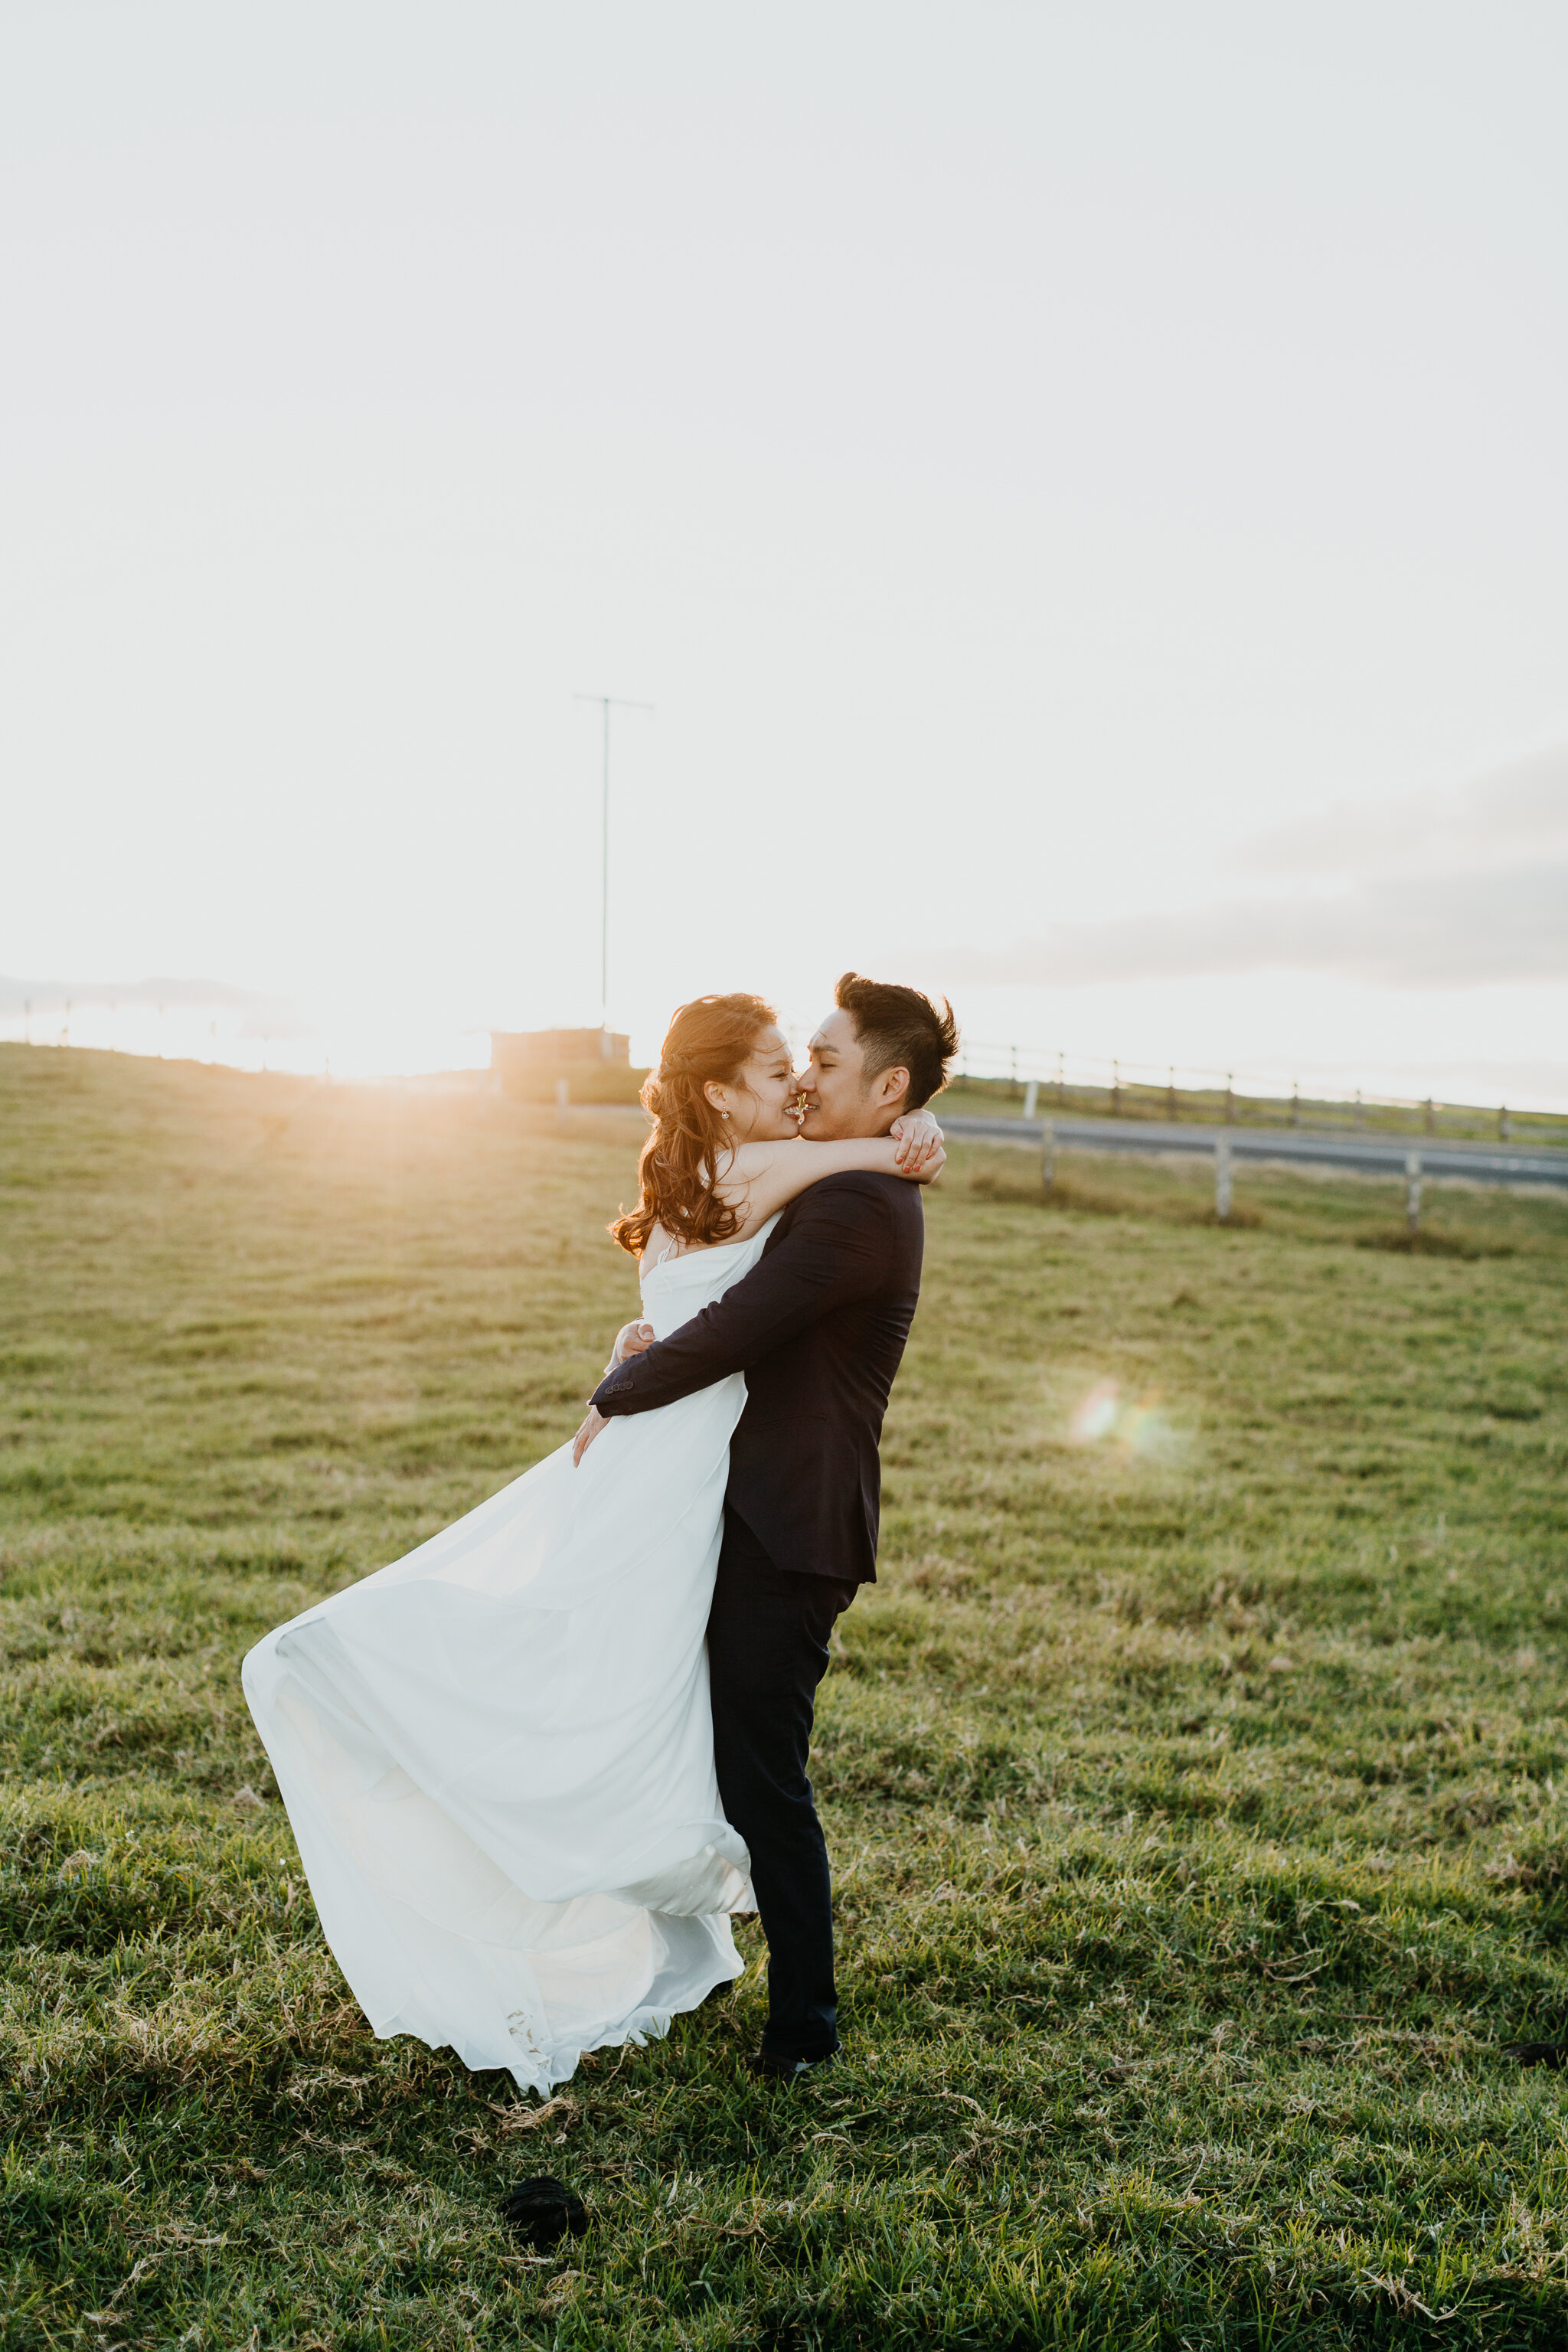 Maleny One Tree Hill Wedding - Maleny Wedding Photographer-26.jpg